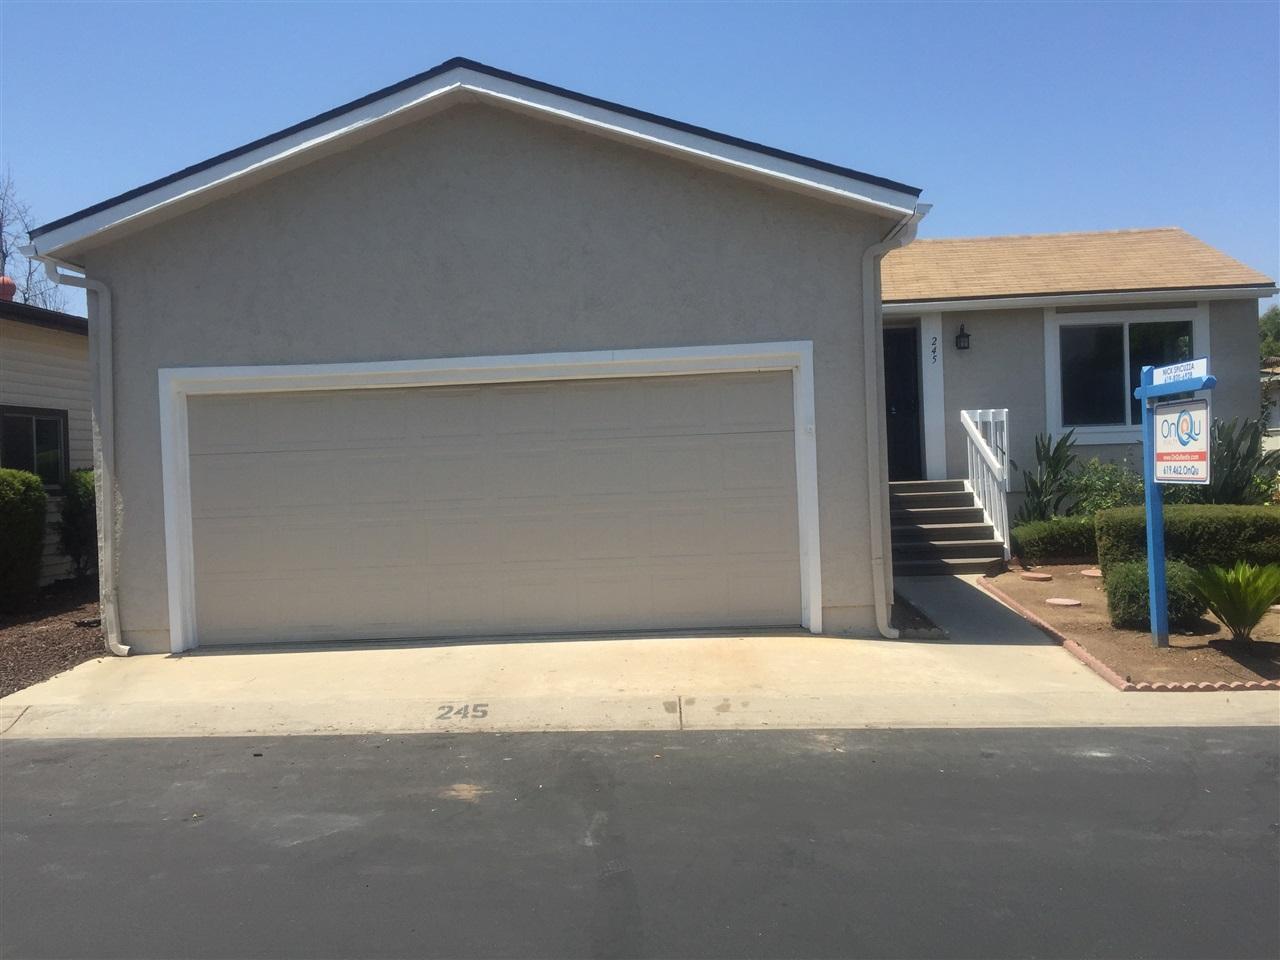 9255 N Magnolia #245, Santee, CA 92071